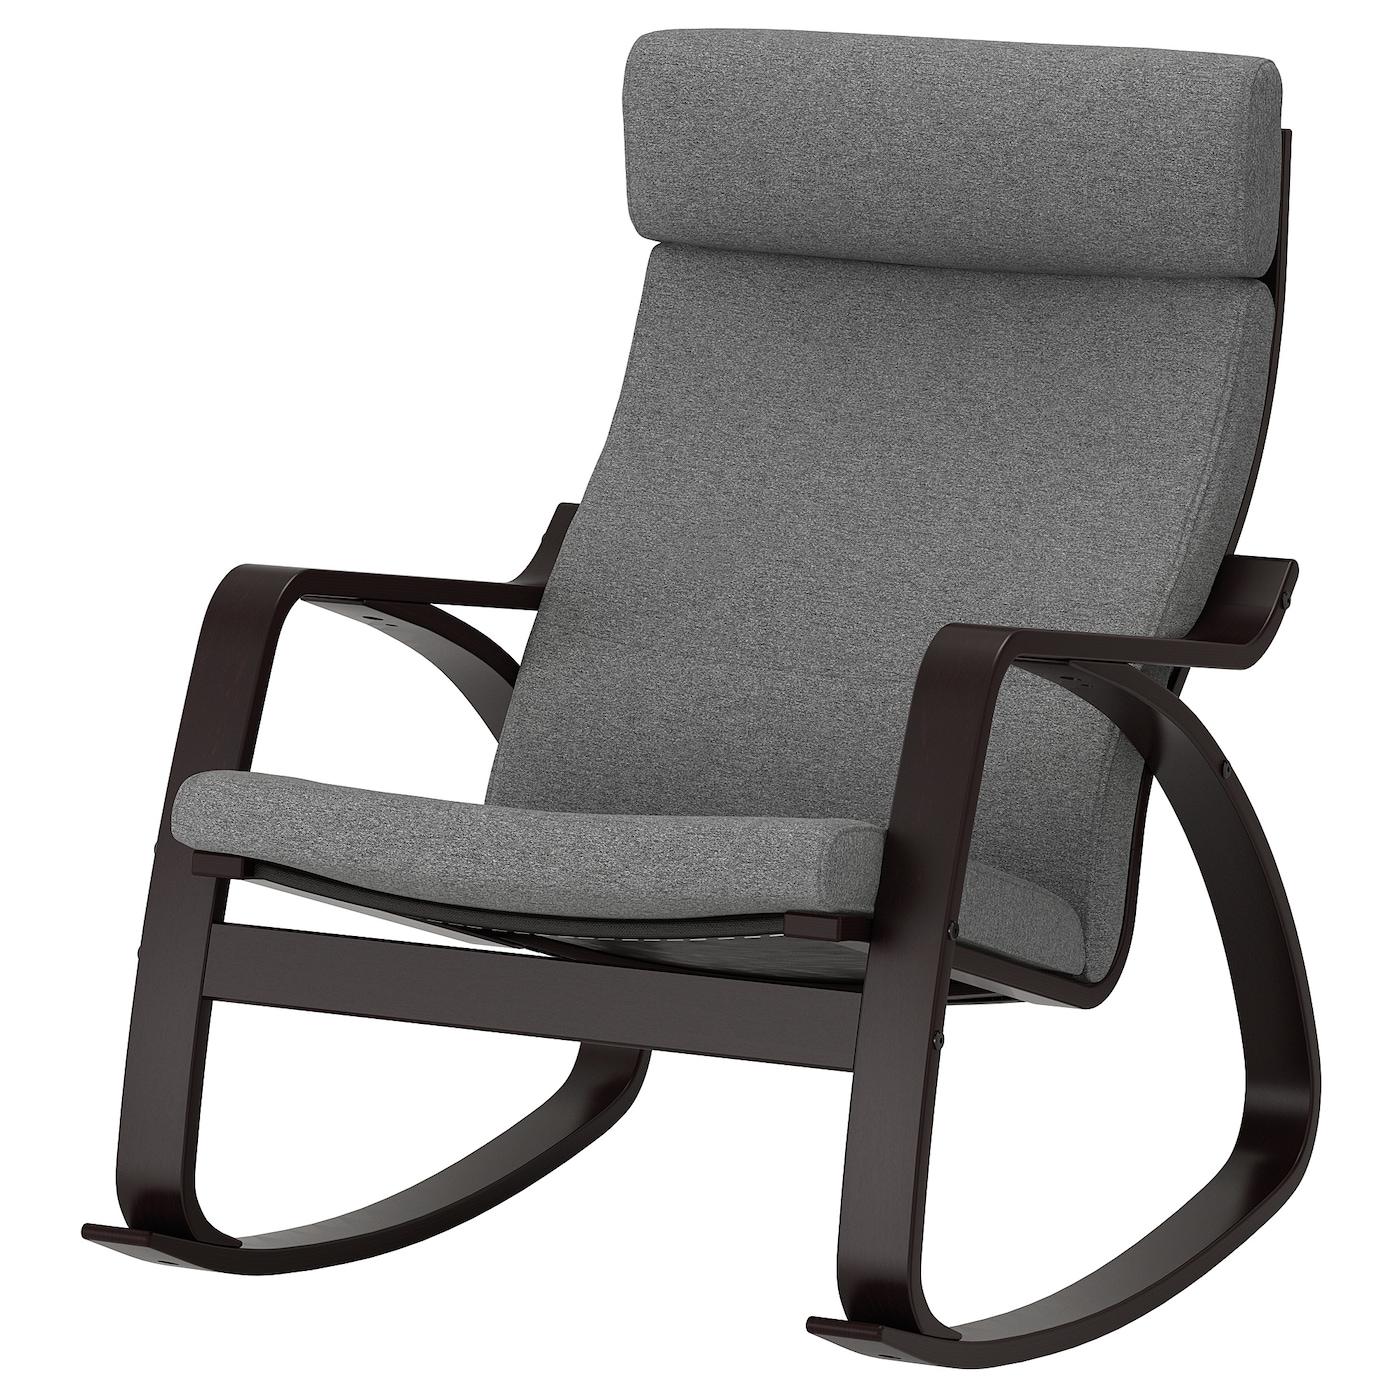 Rocking Chair Poang Black Brown Lysed Grey